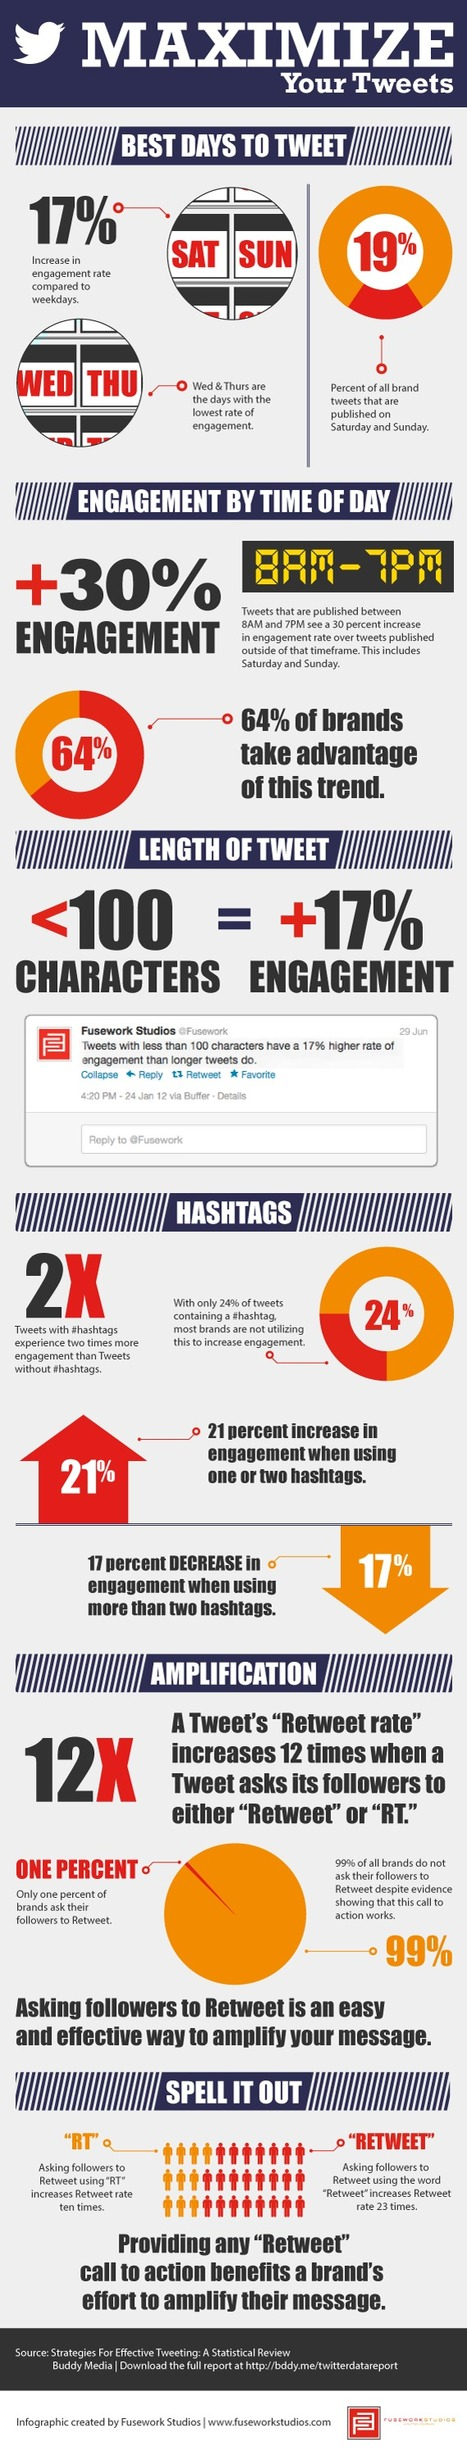 Maximizing Your Tweets (Infographic) | Webmarketing & Communication | Scoop.it